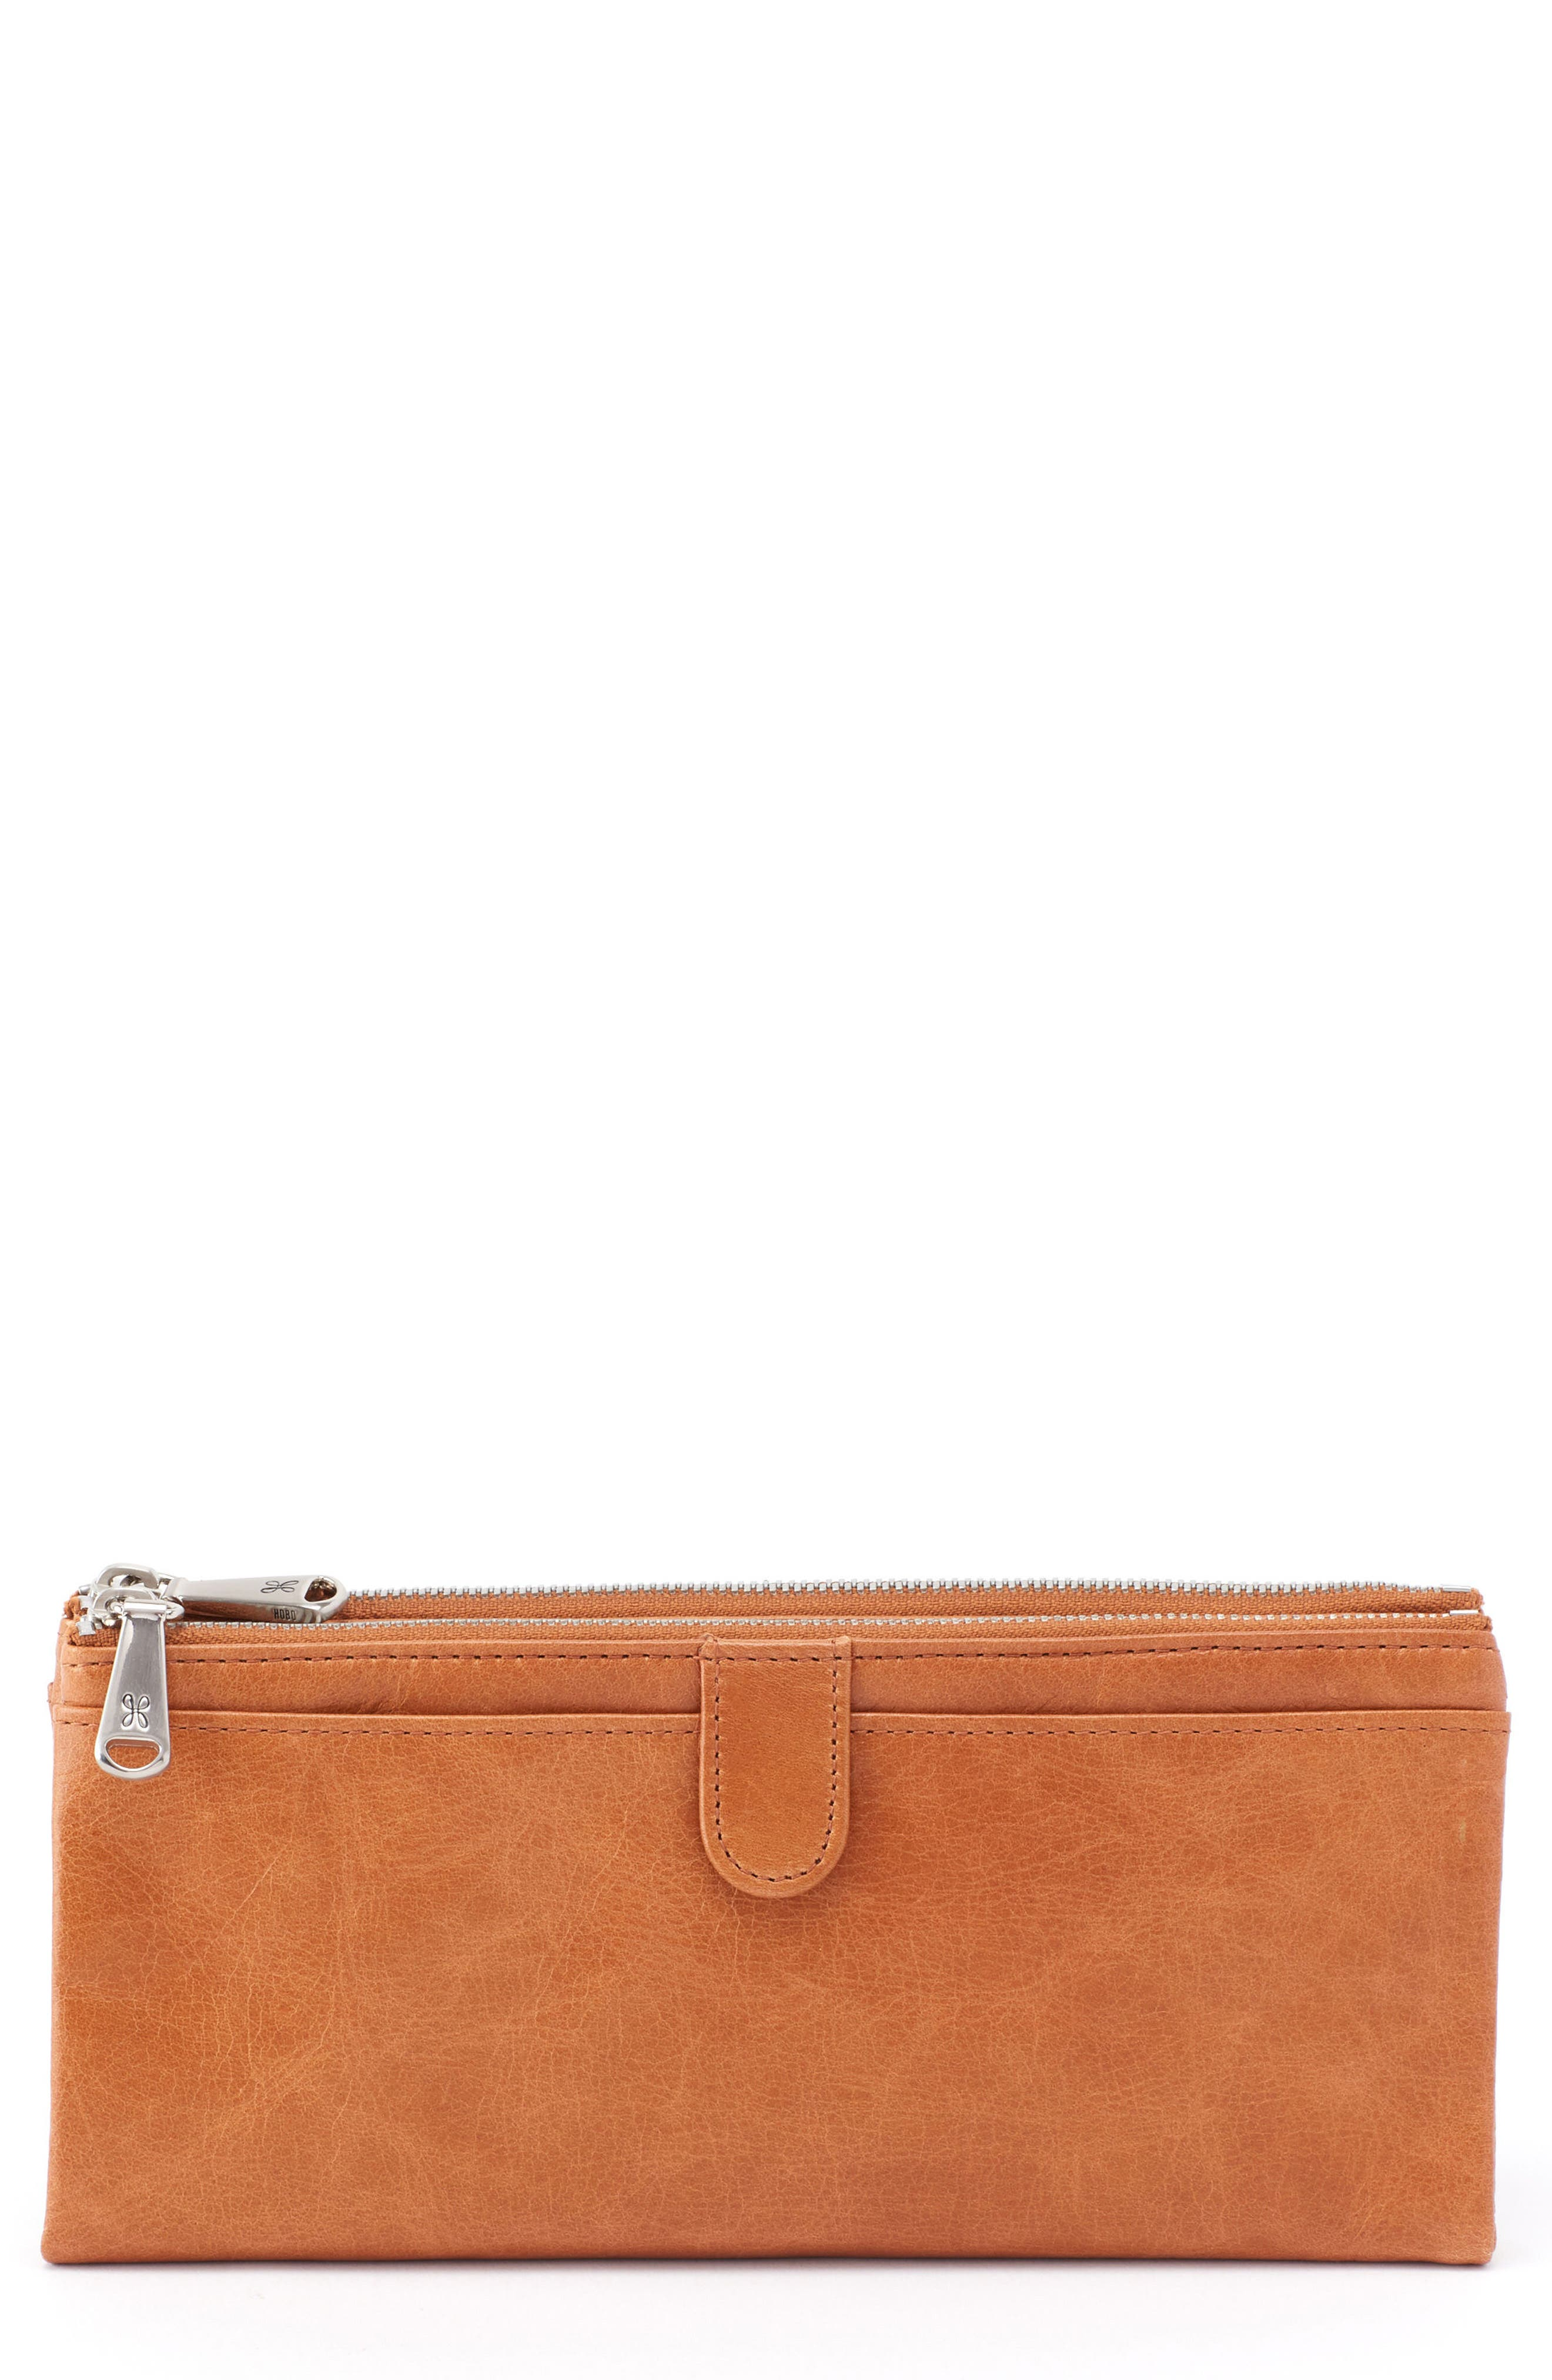 Main Image - Hobo 'Taylor' Glazed Leather Wallet